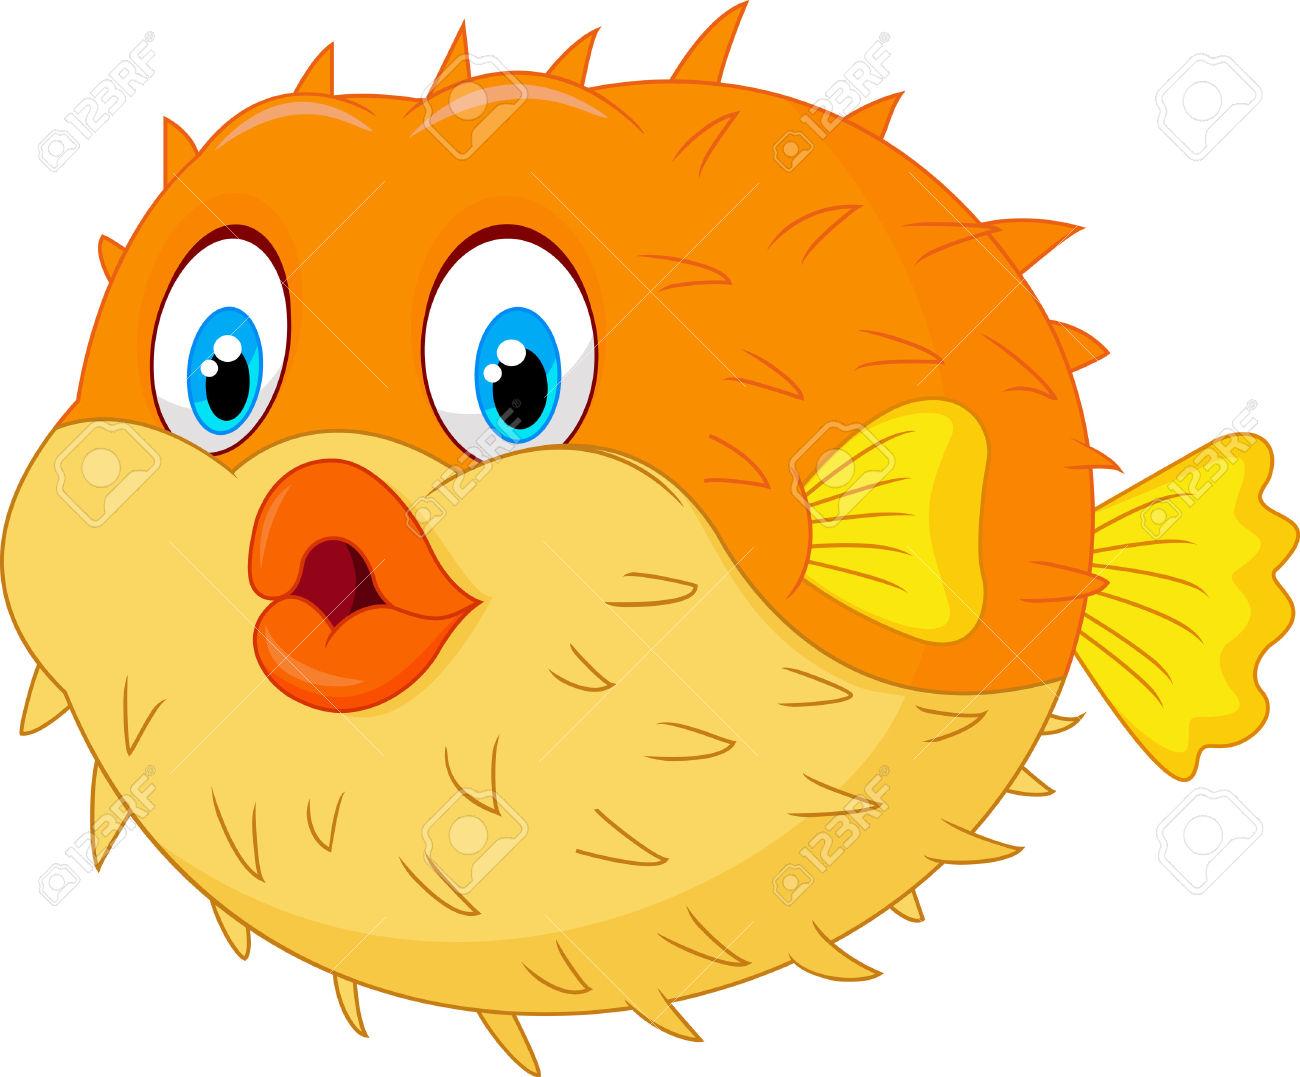 Pufferfish clipart Clipart Clipart fish puffer Fans